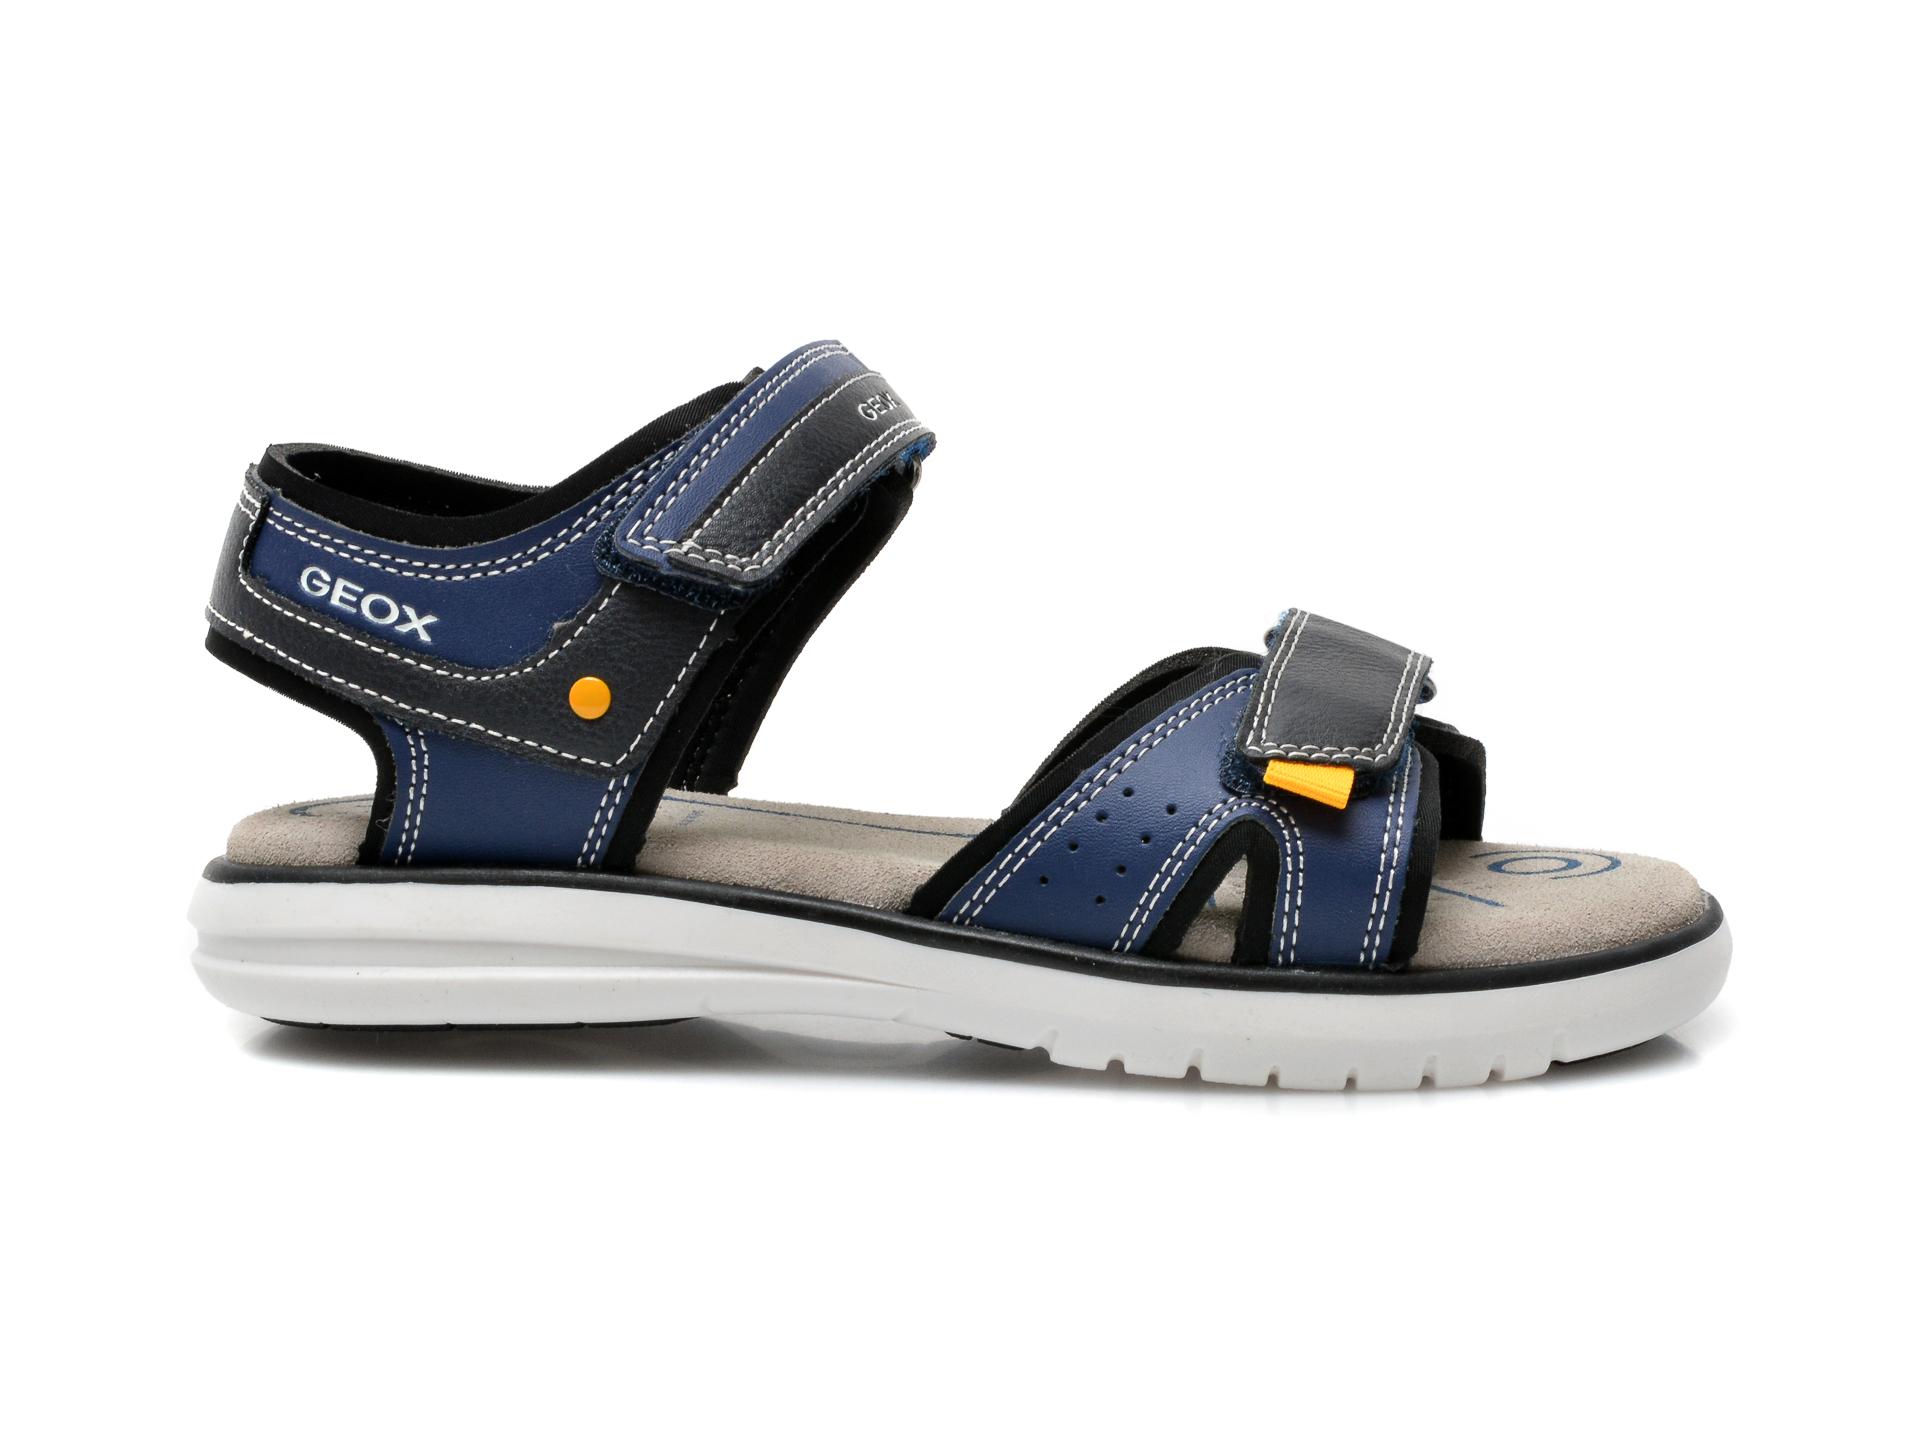 Sandale GEOX bleumarin, J15DRA, din piele ecologica - 1